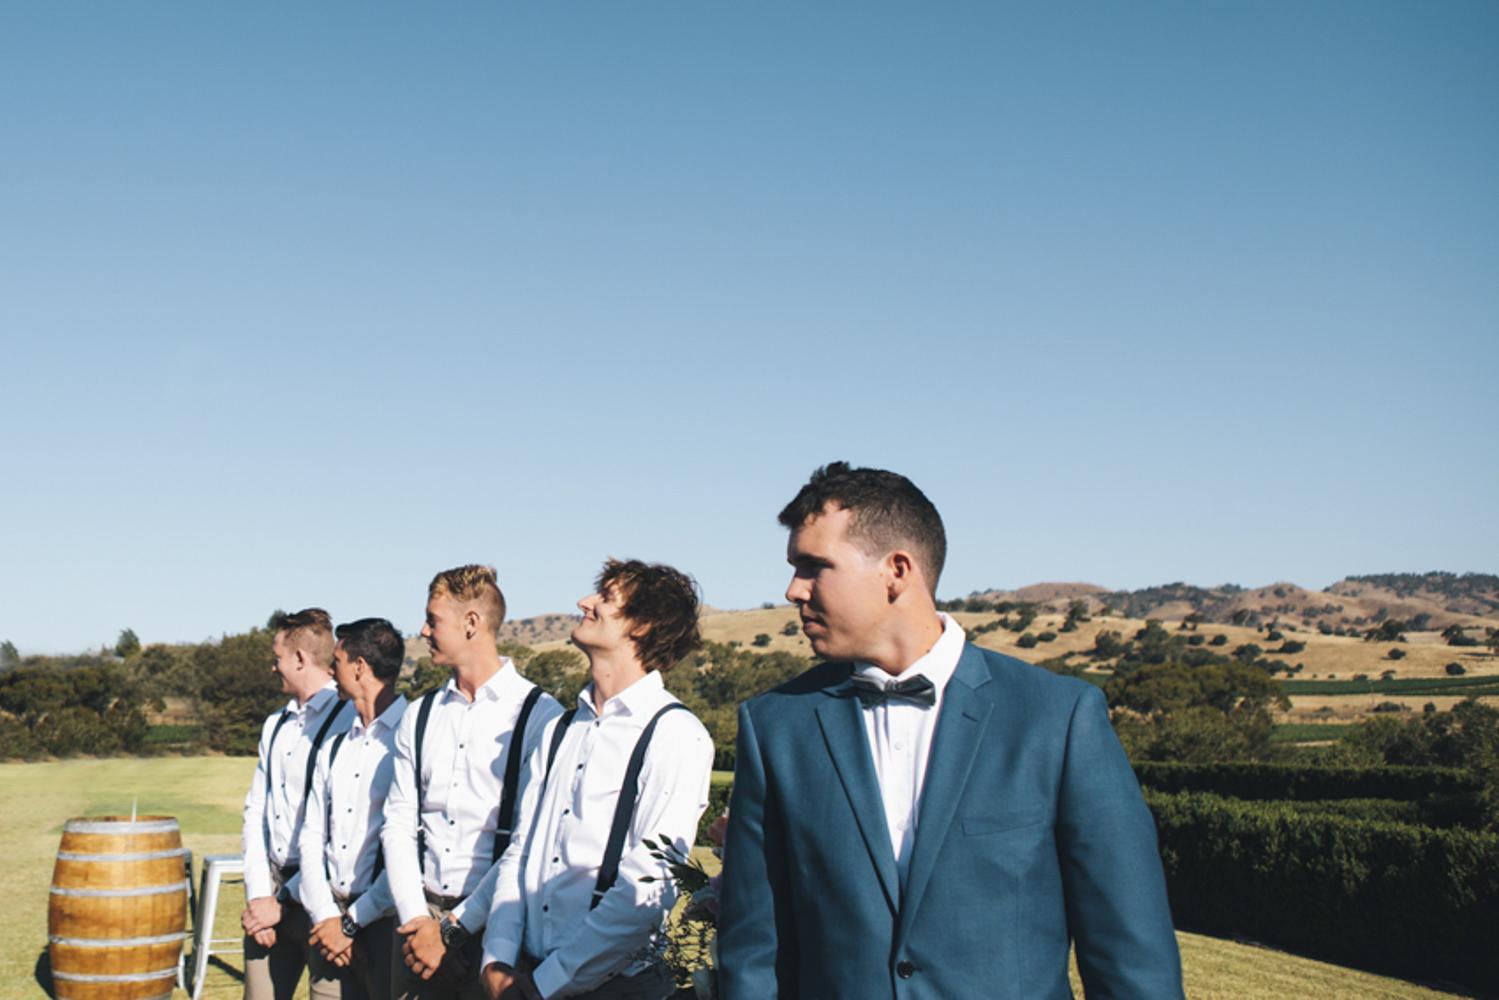 adelaide.hills.vineyard.wedding.south.australia.barossa.valley111.jpeg